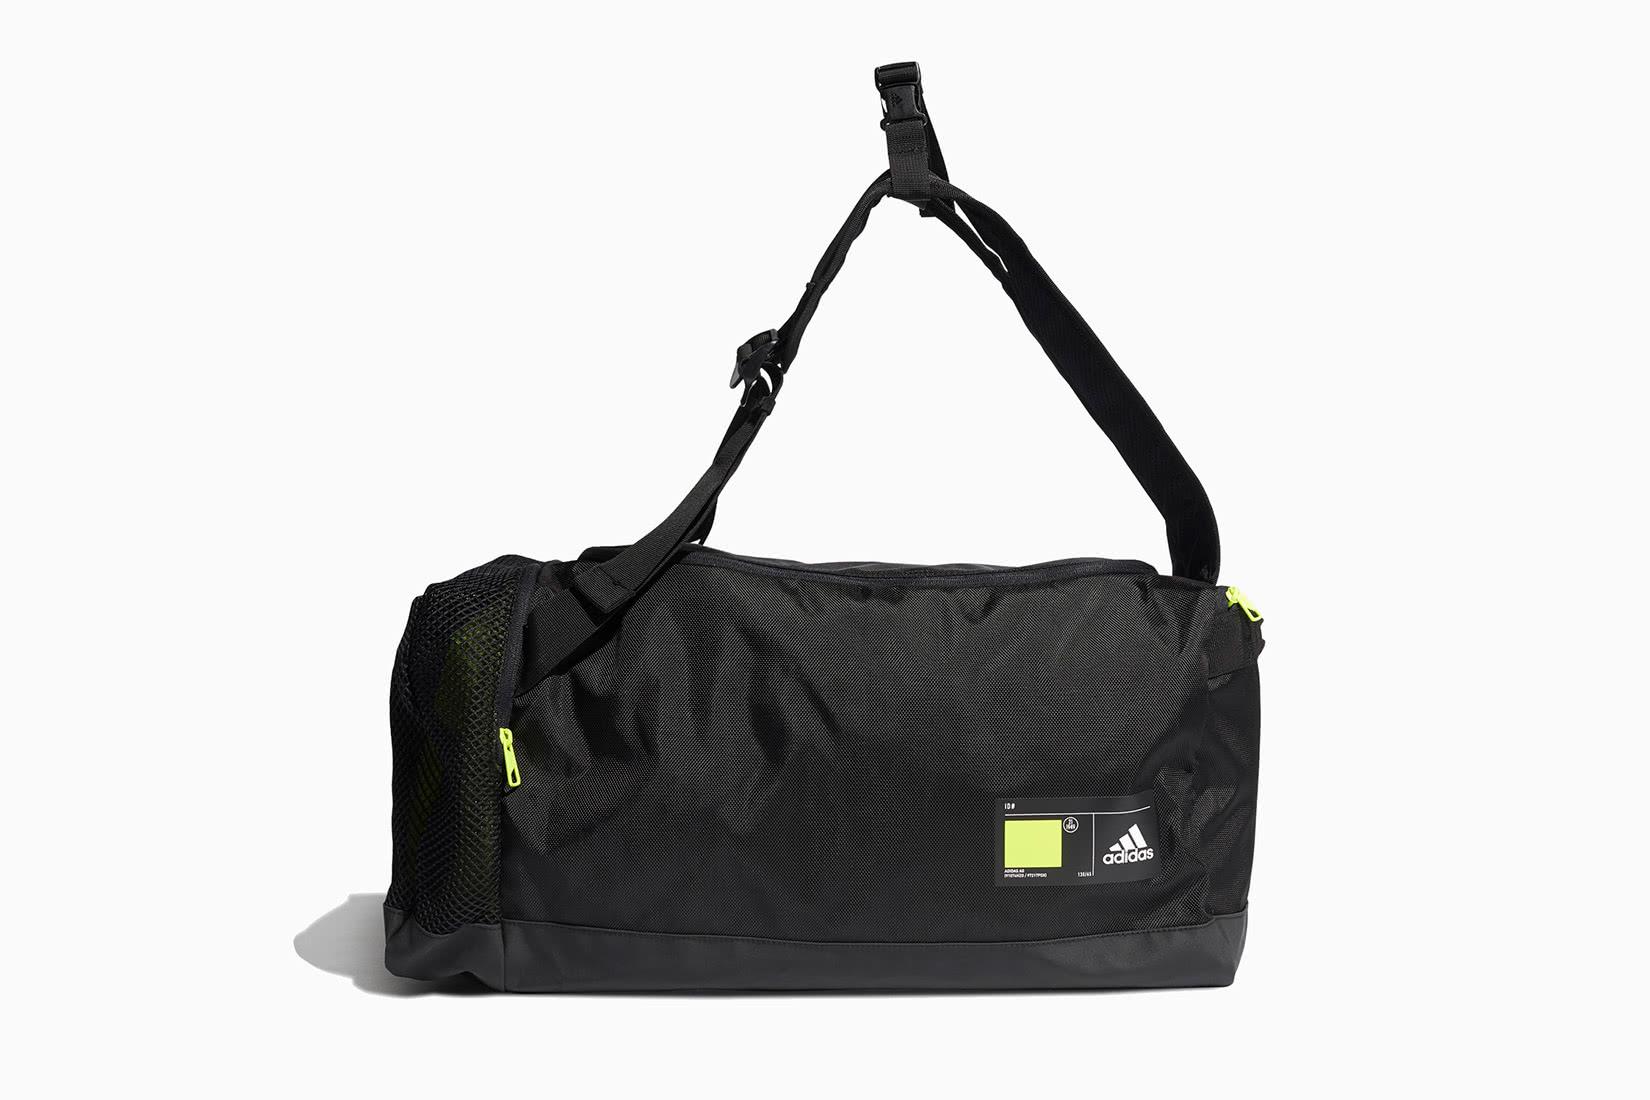 best men gym bag duffle adidas review - Luxe Digital